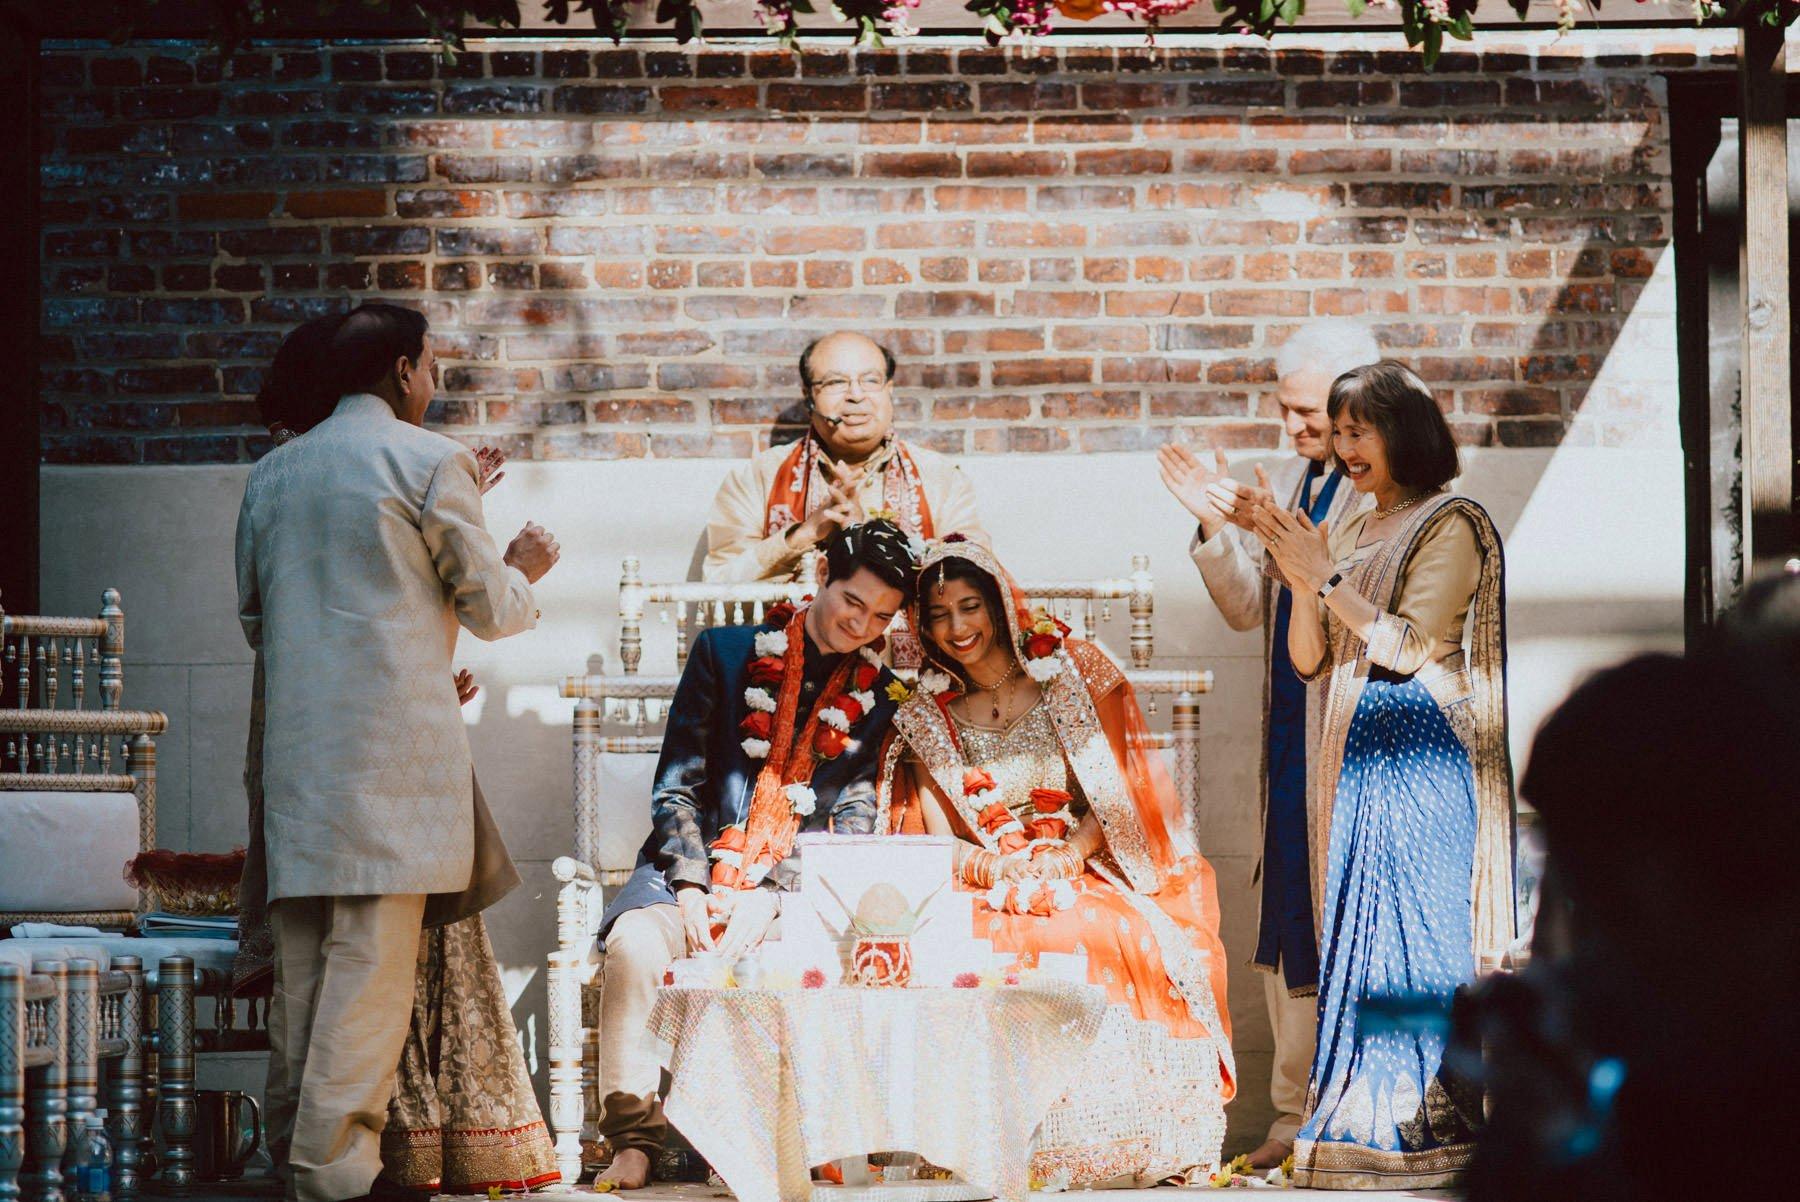 vie-philadelphia-indian-wedding-84.jpg